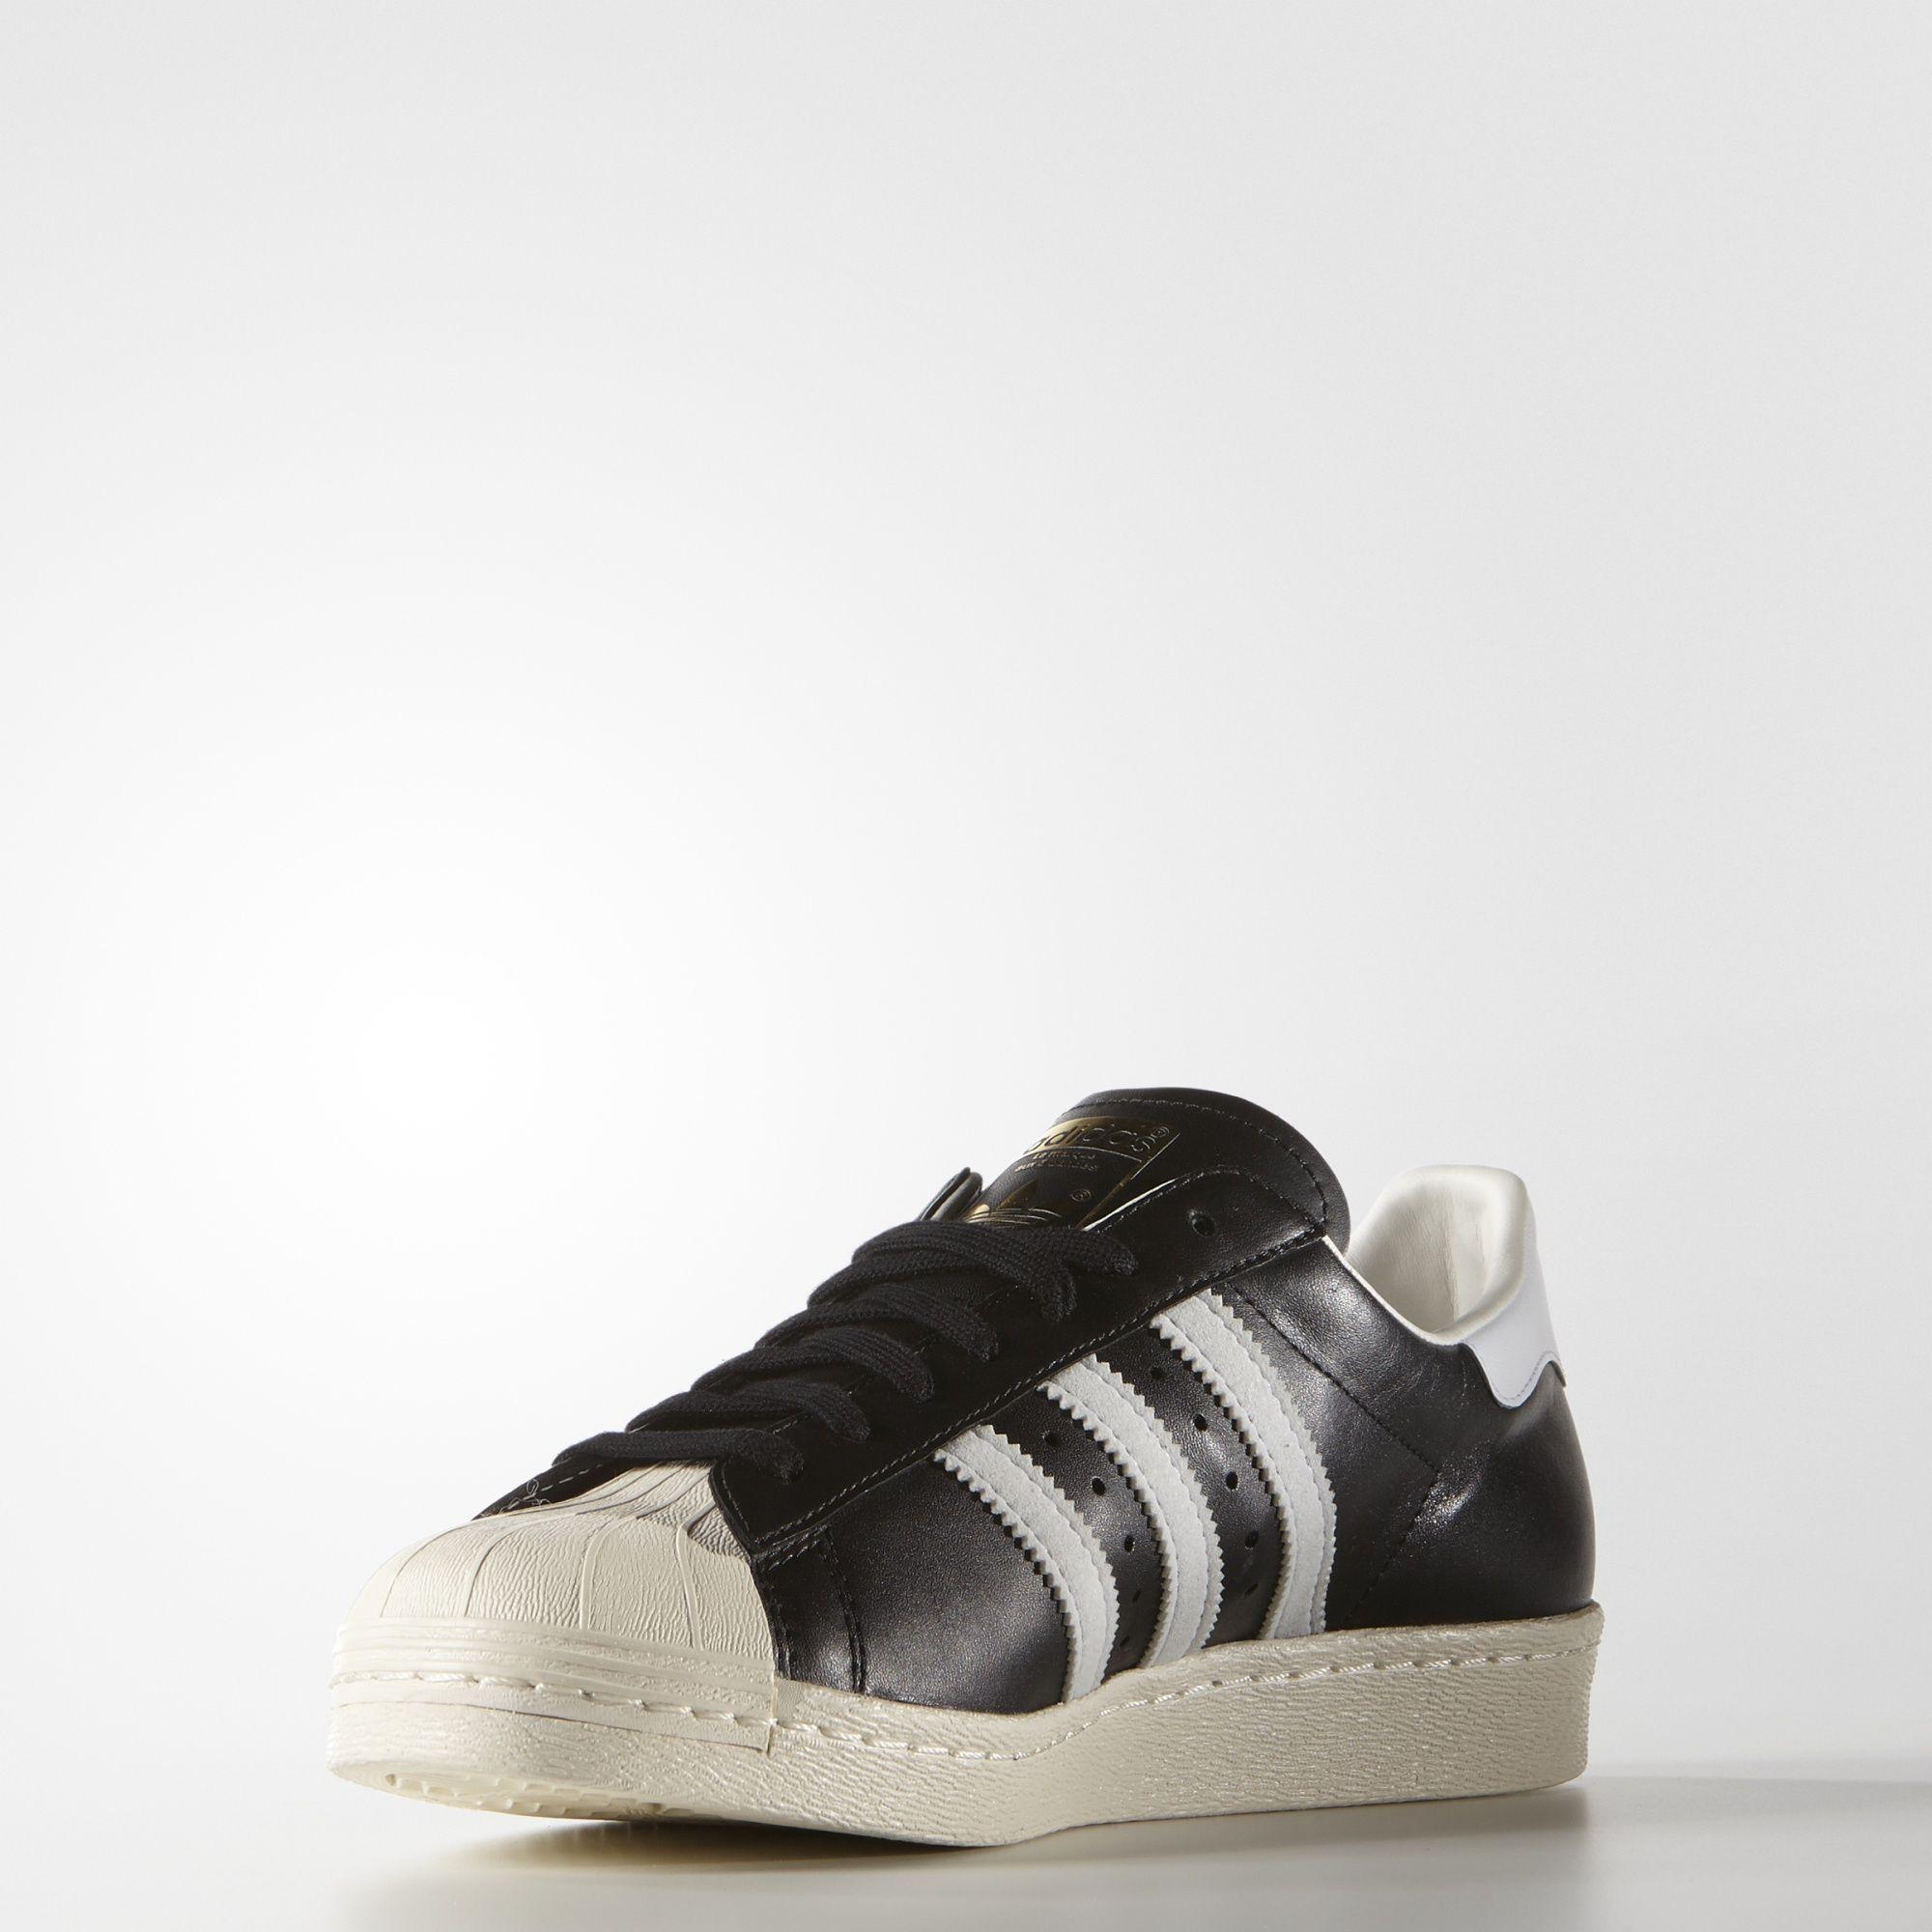 adidas - Tenis Originals Superstar 80S